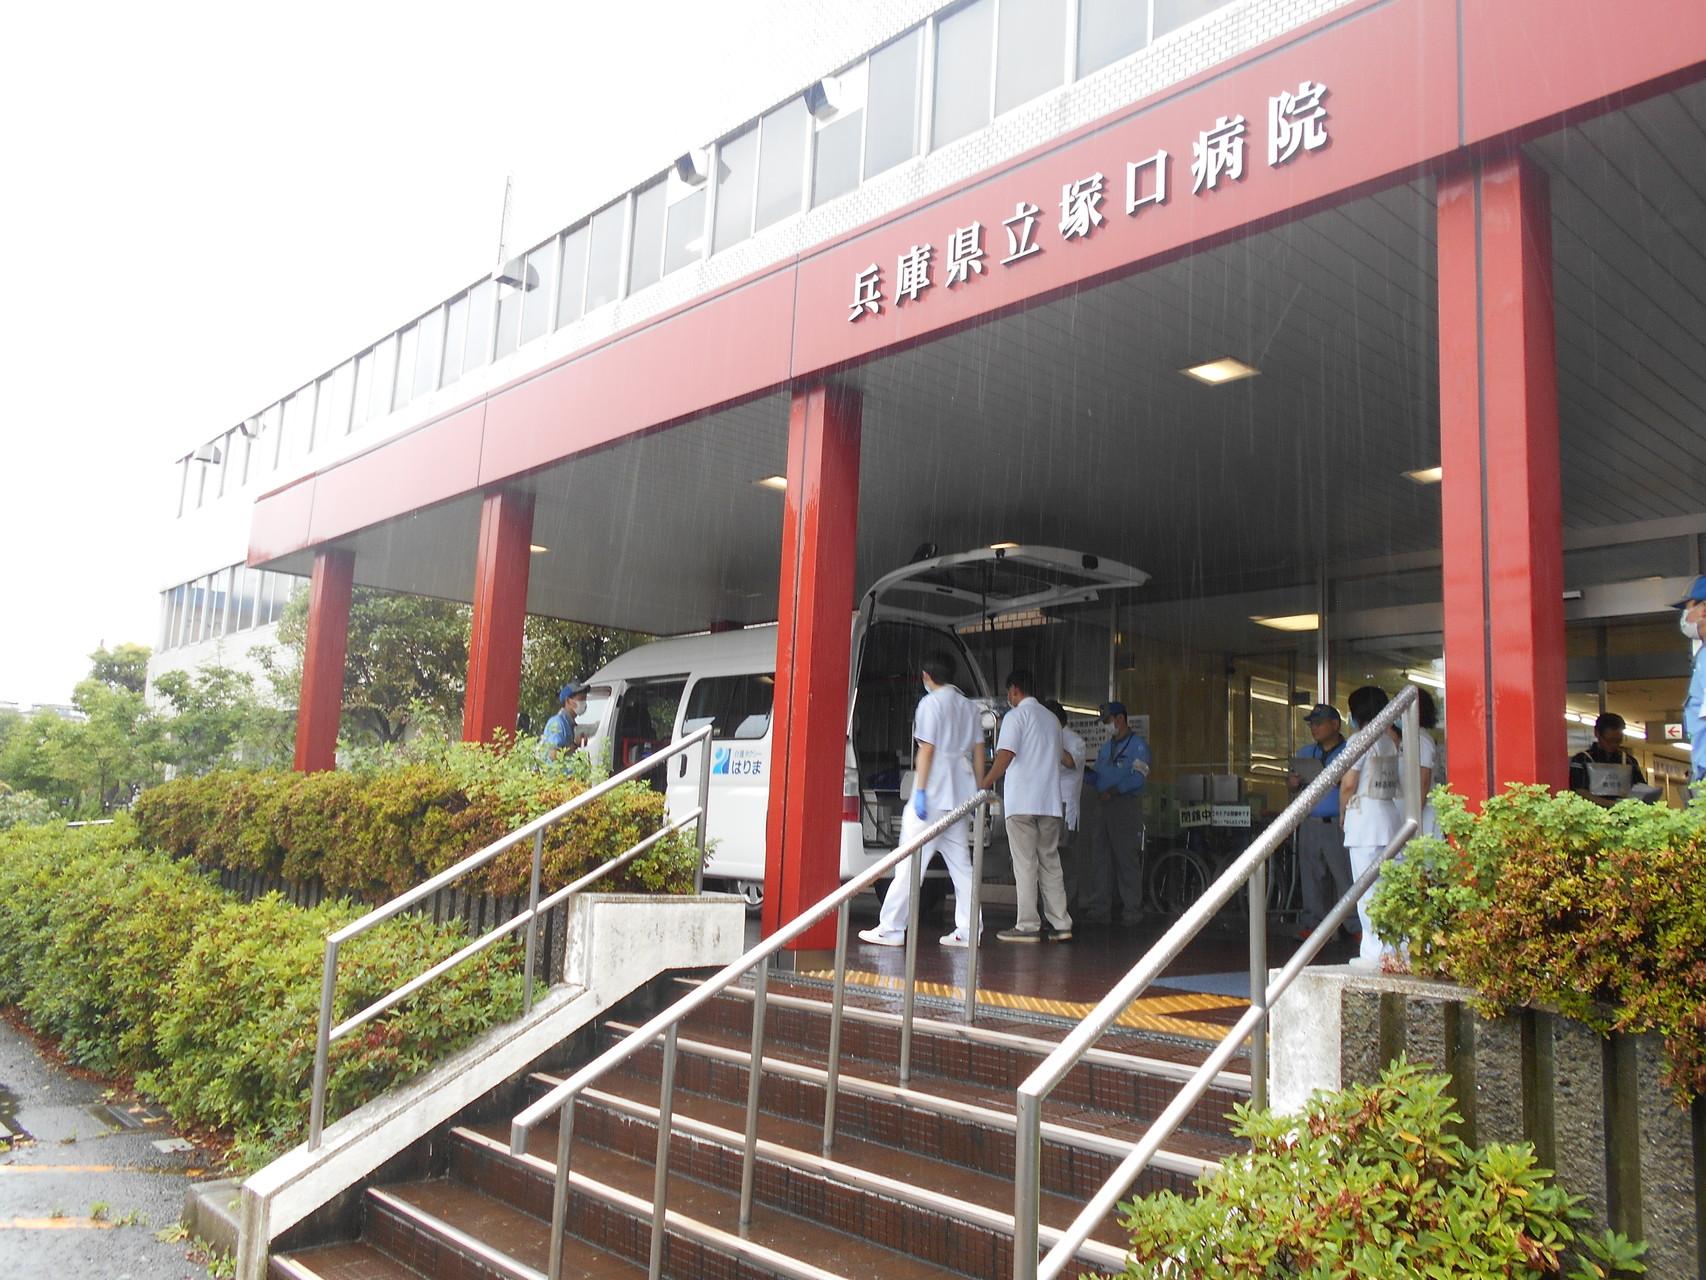 兵庫県立塚口病院玄関で患者様待ち